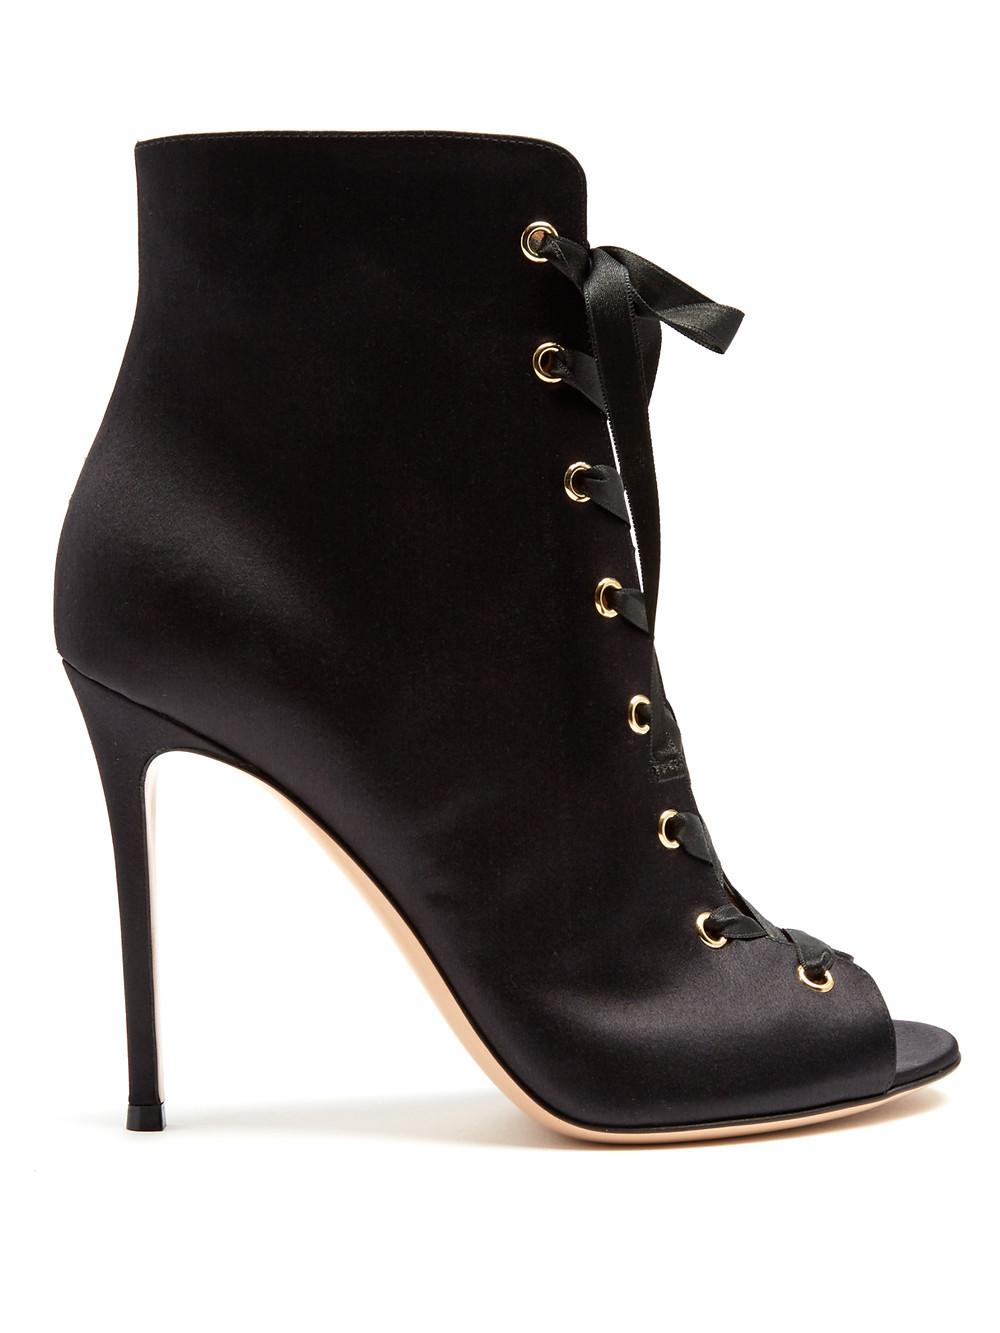 gianvito rossi black satin booties